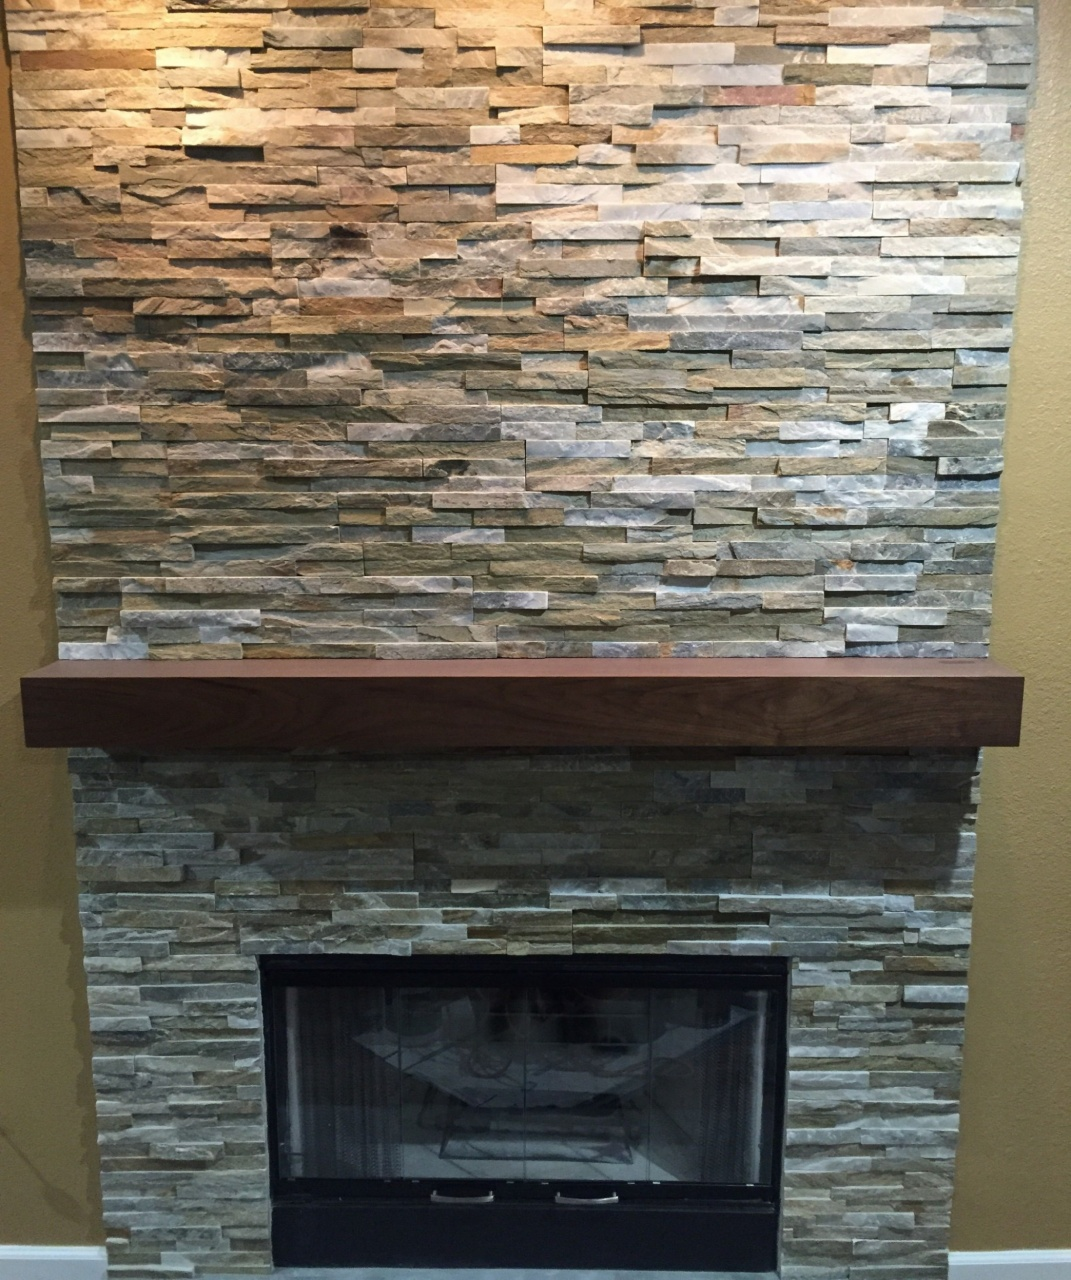 built in electric fireplace ideas diy fireplace mantel inspirational mantel shelves from built in electric fireplace ideas